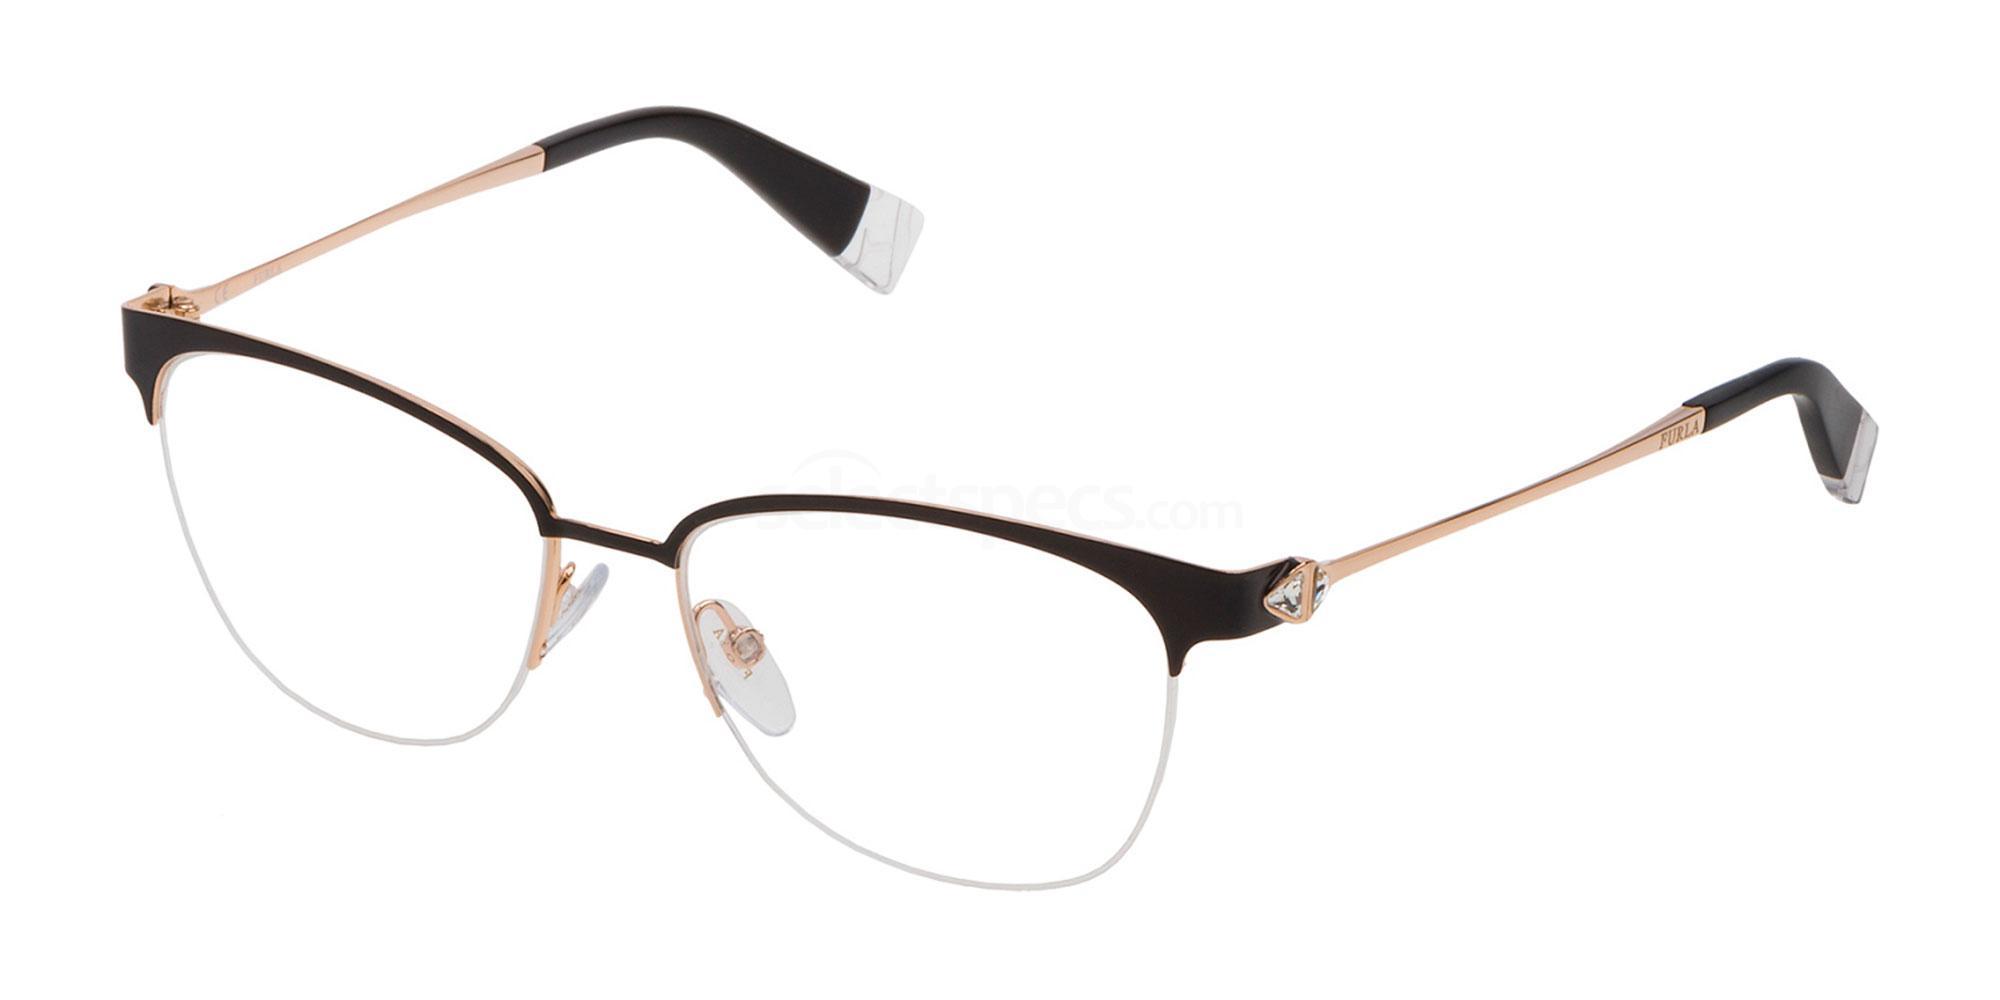 0304 VFU188S Glasses, Furla